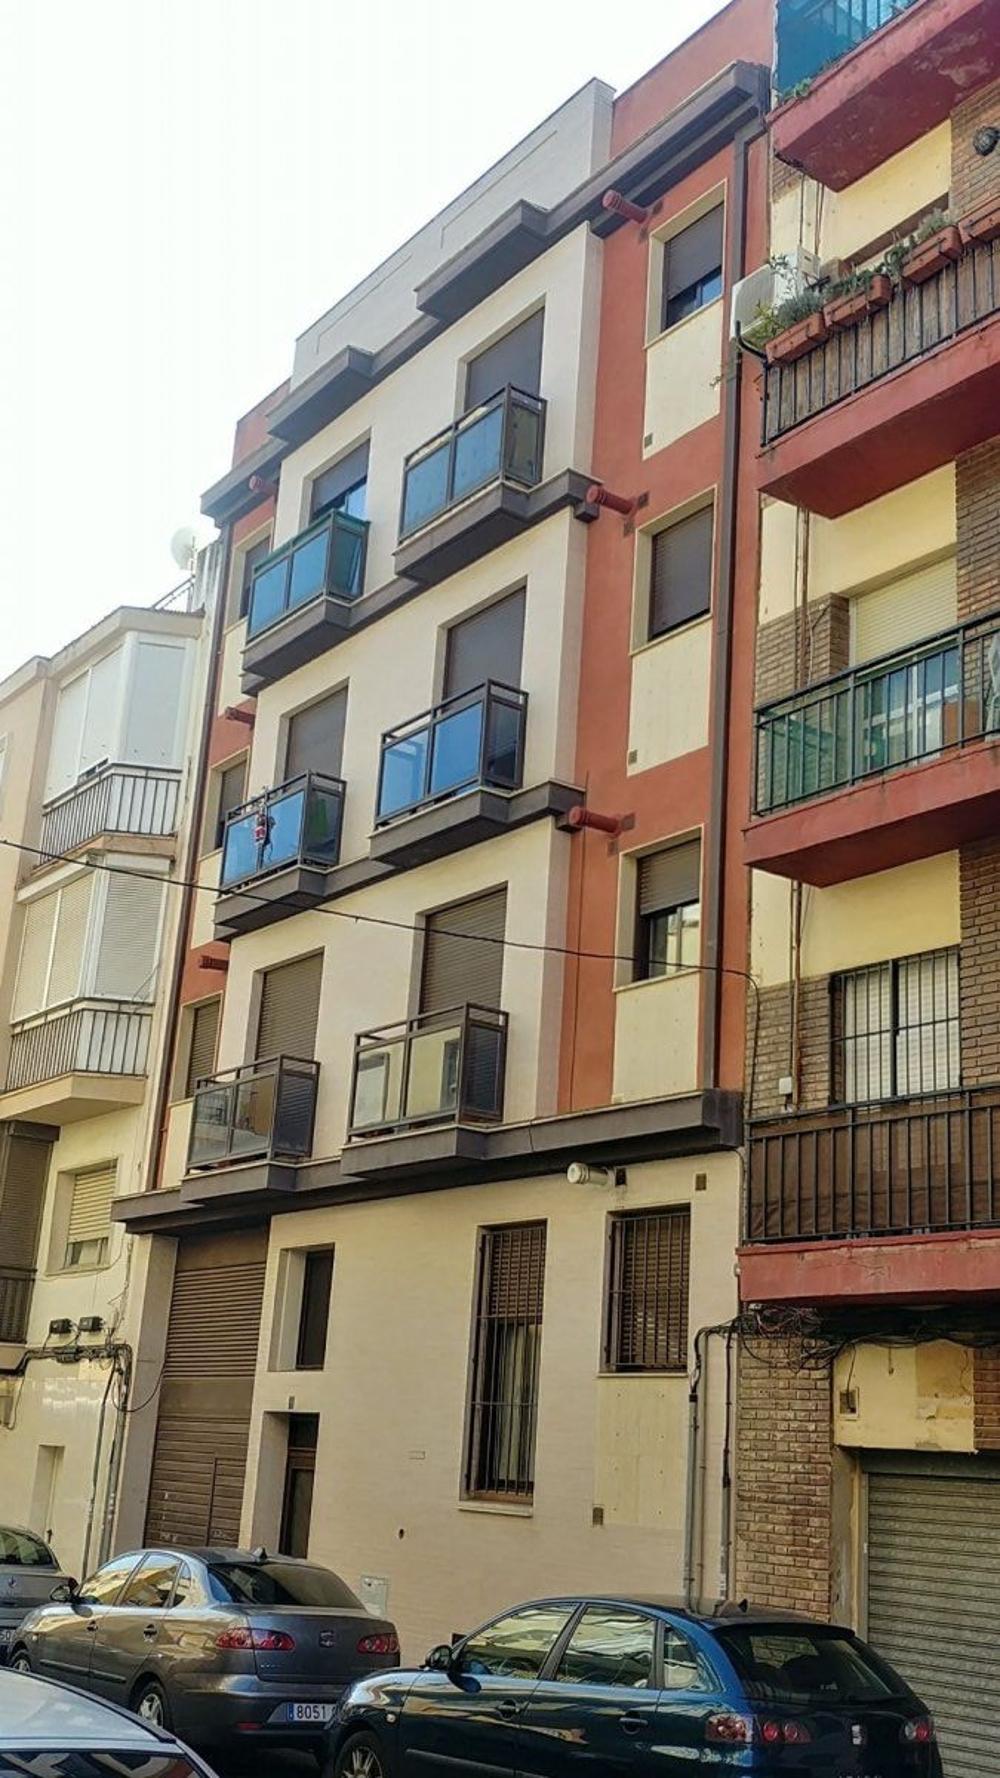 isla chica huelva appartement photo 3845025